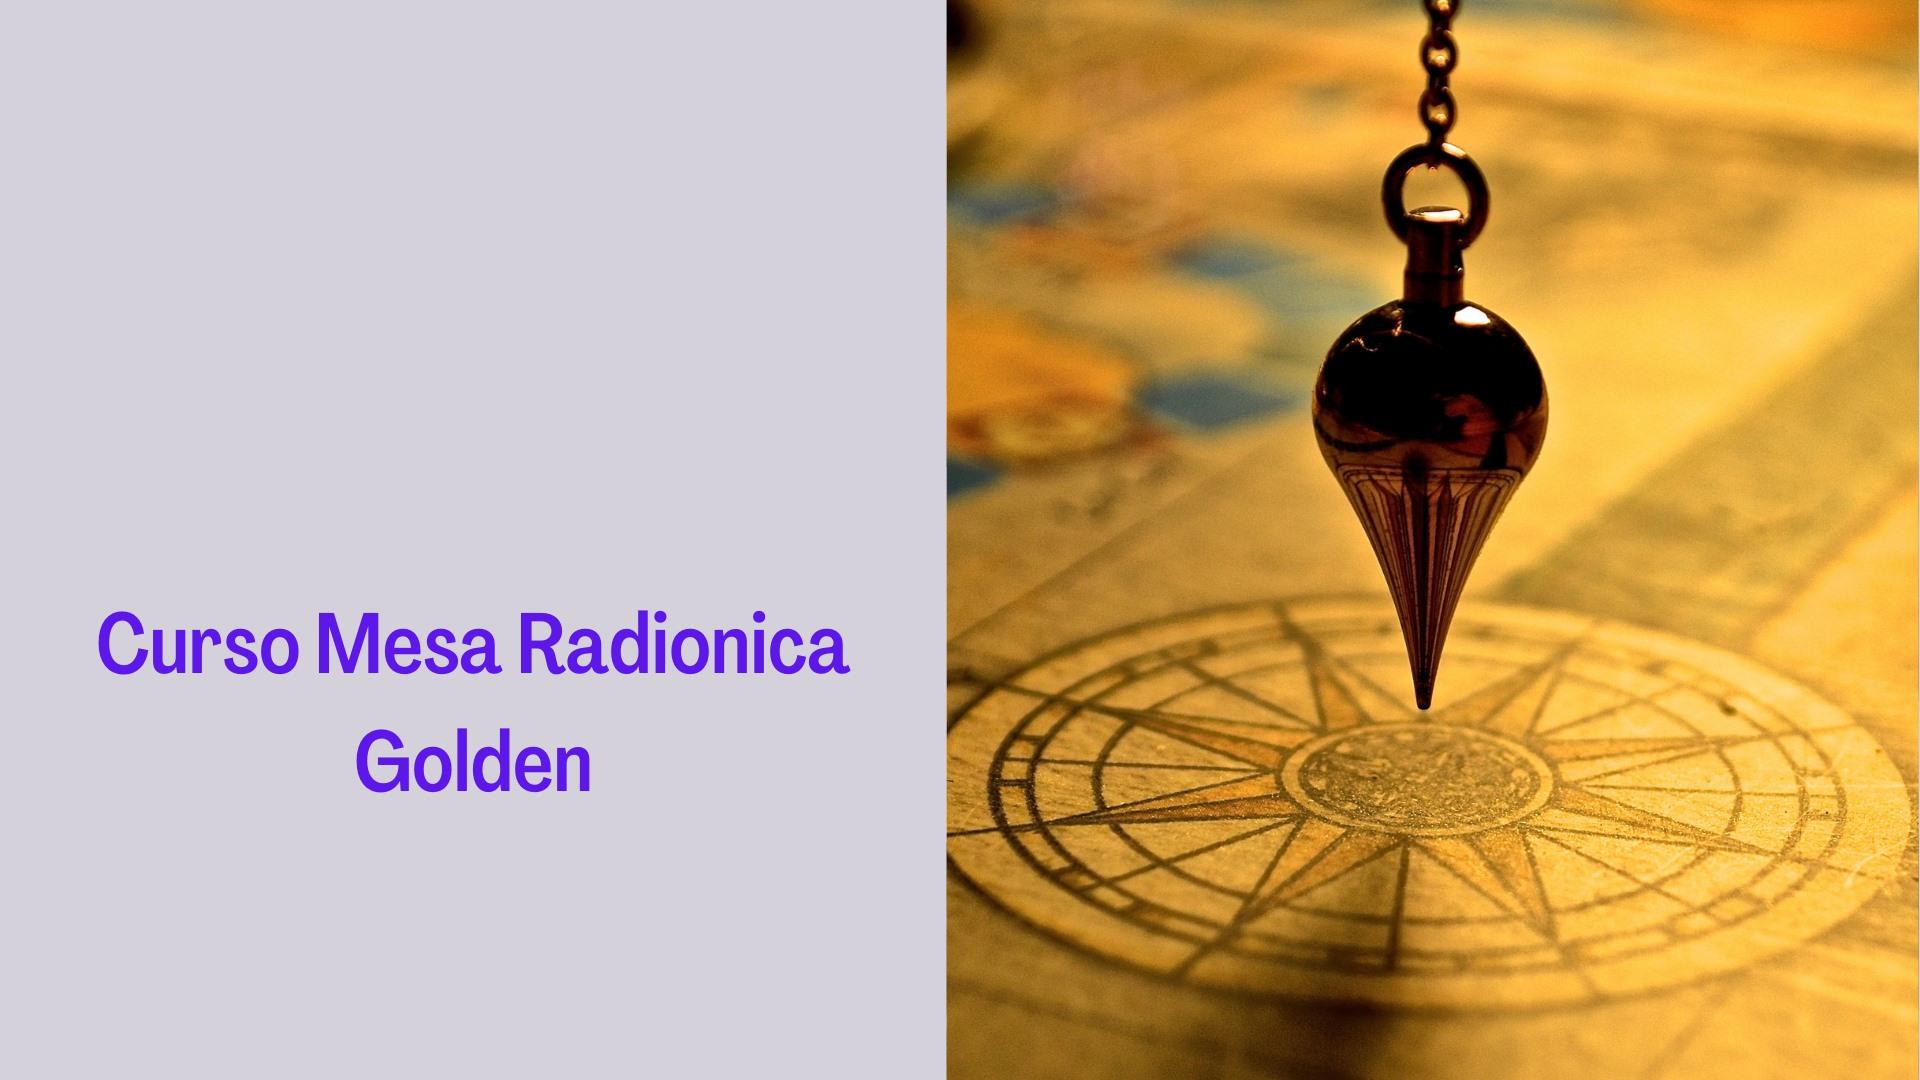 Curso Mesa Radionica Golden